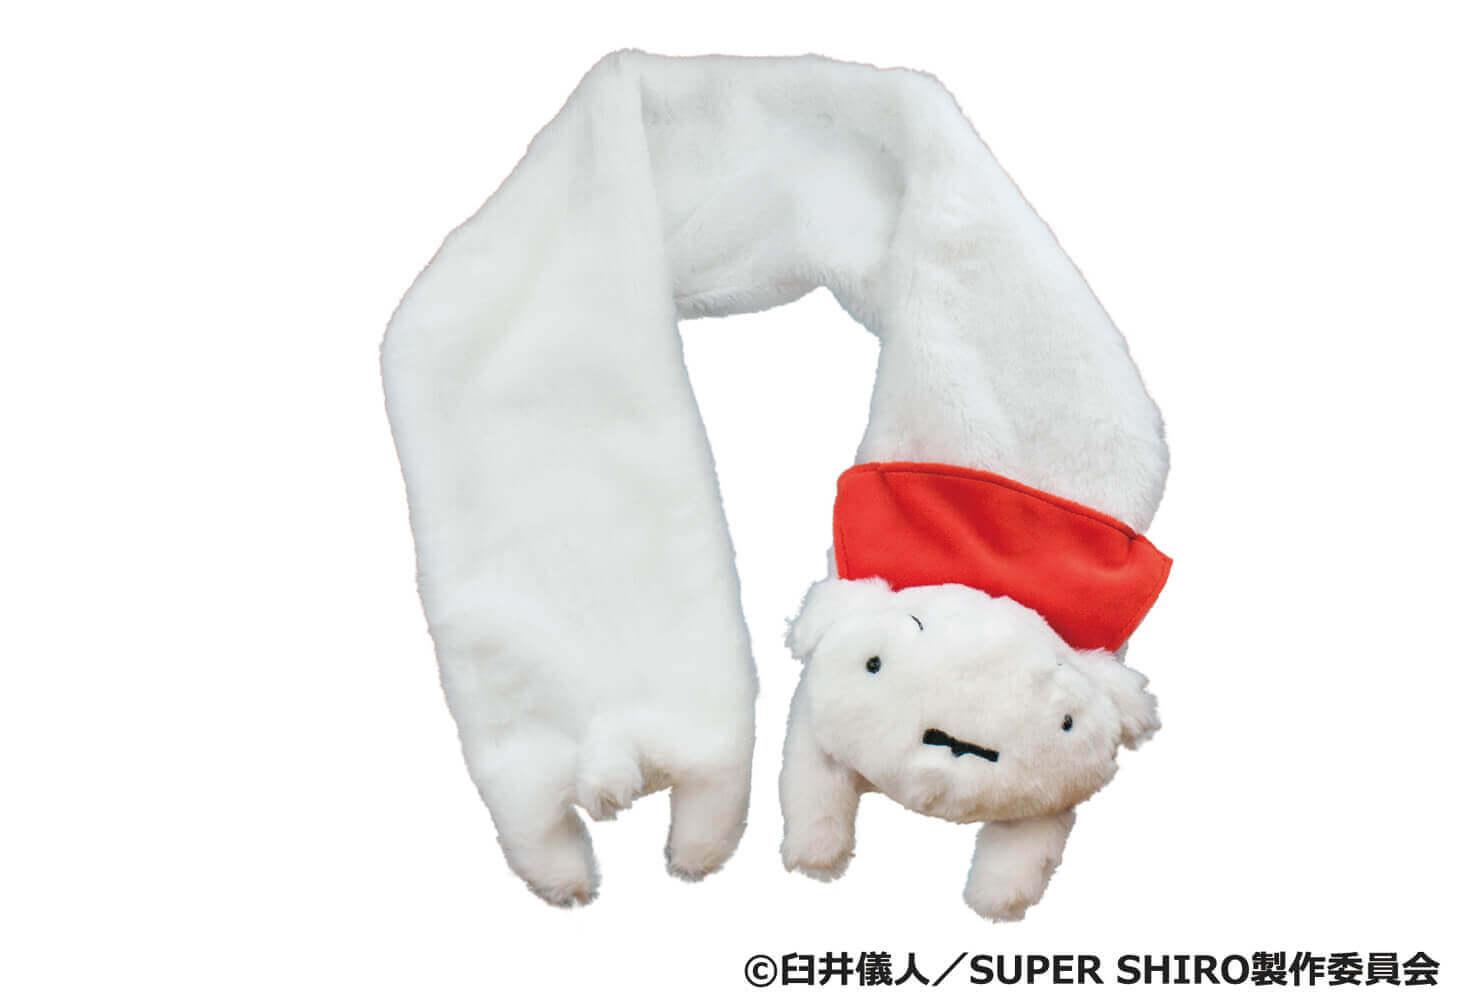 SUPER SHIRO そらとぶスーパーシロのぬいぐるみマフラー